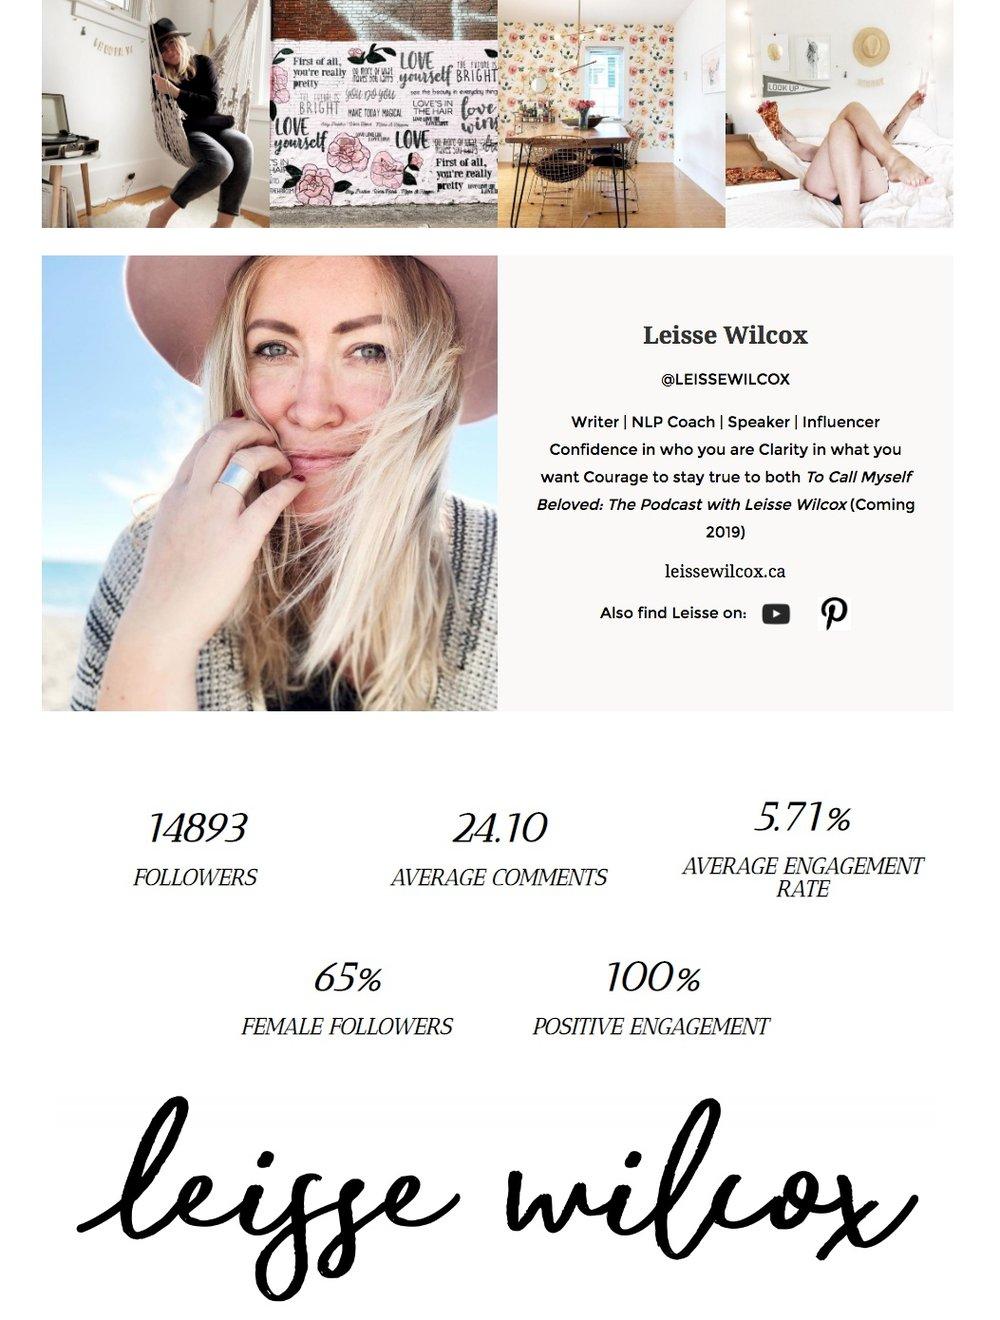 leisse+wilcox+media+kit